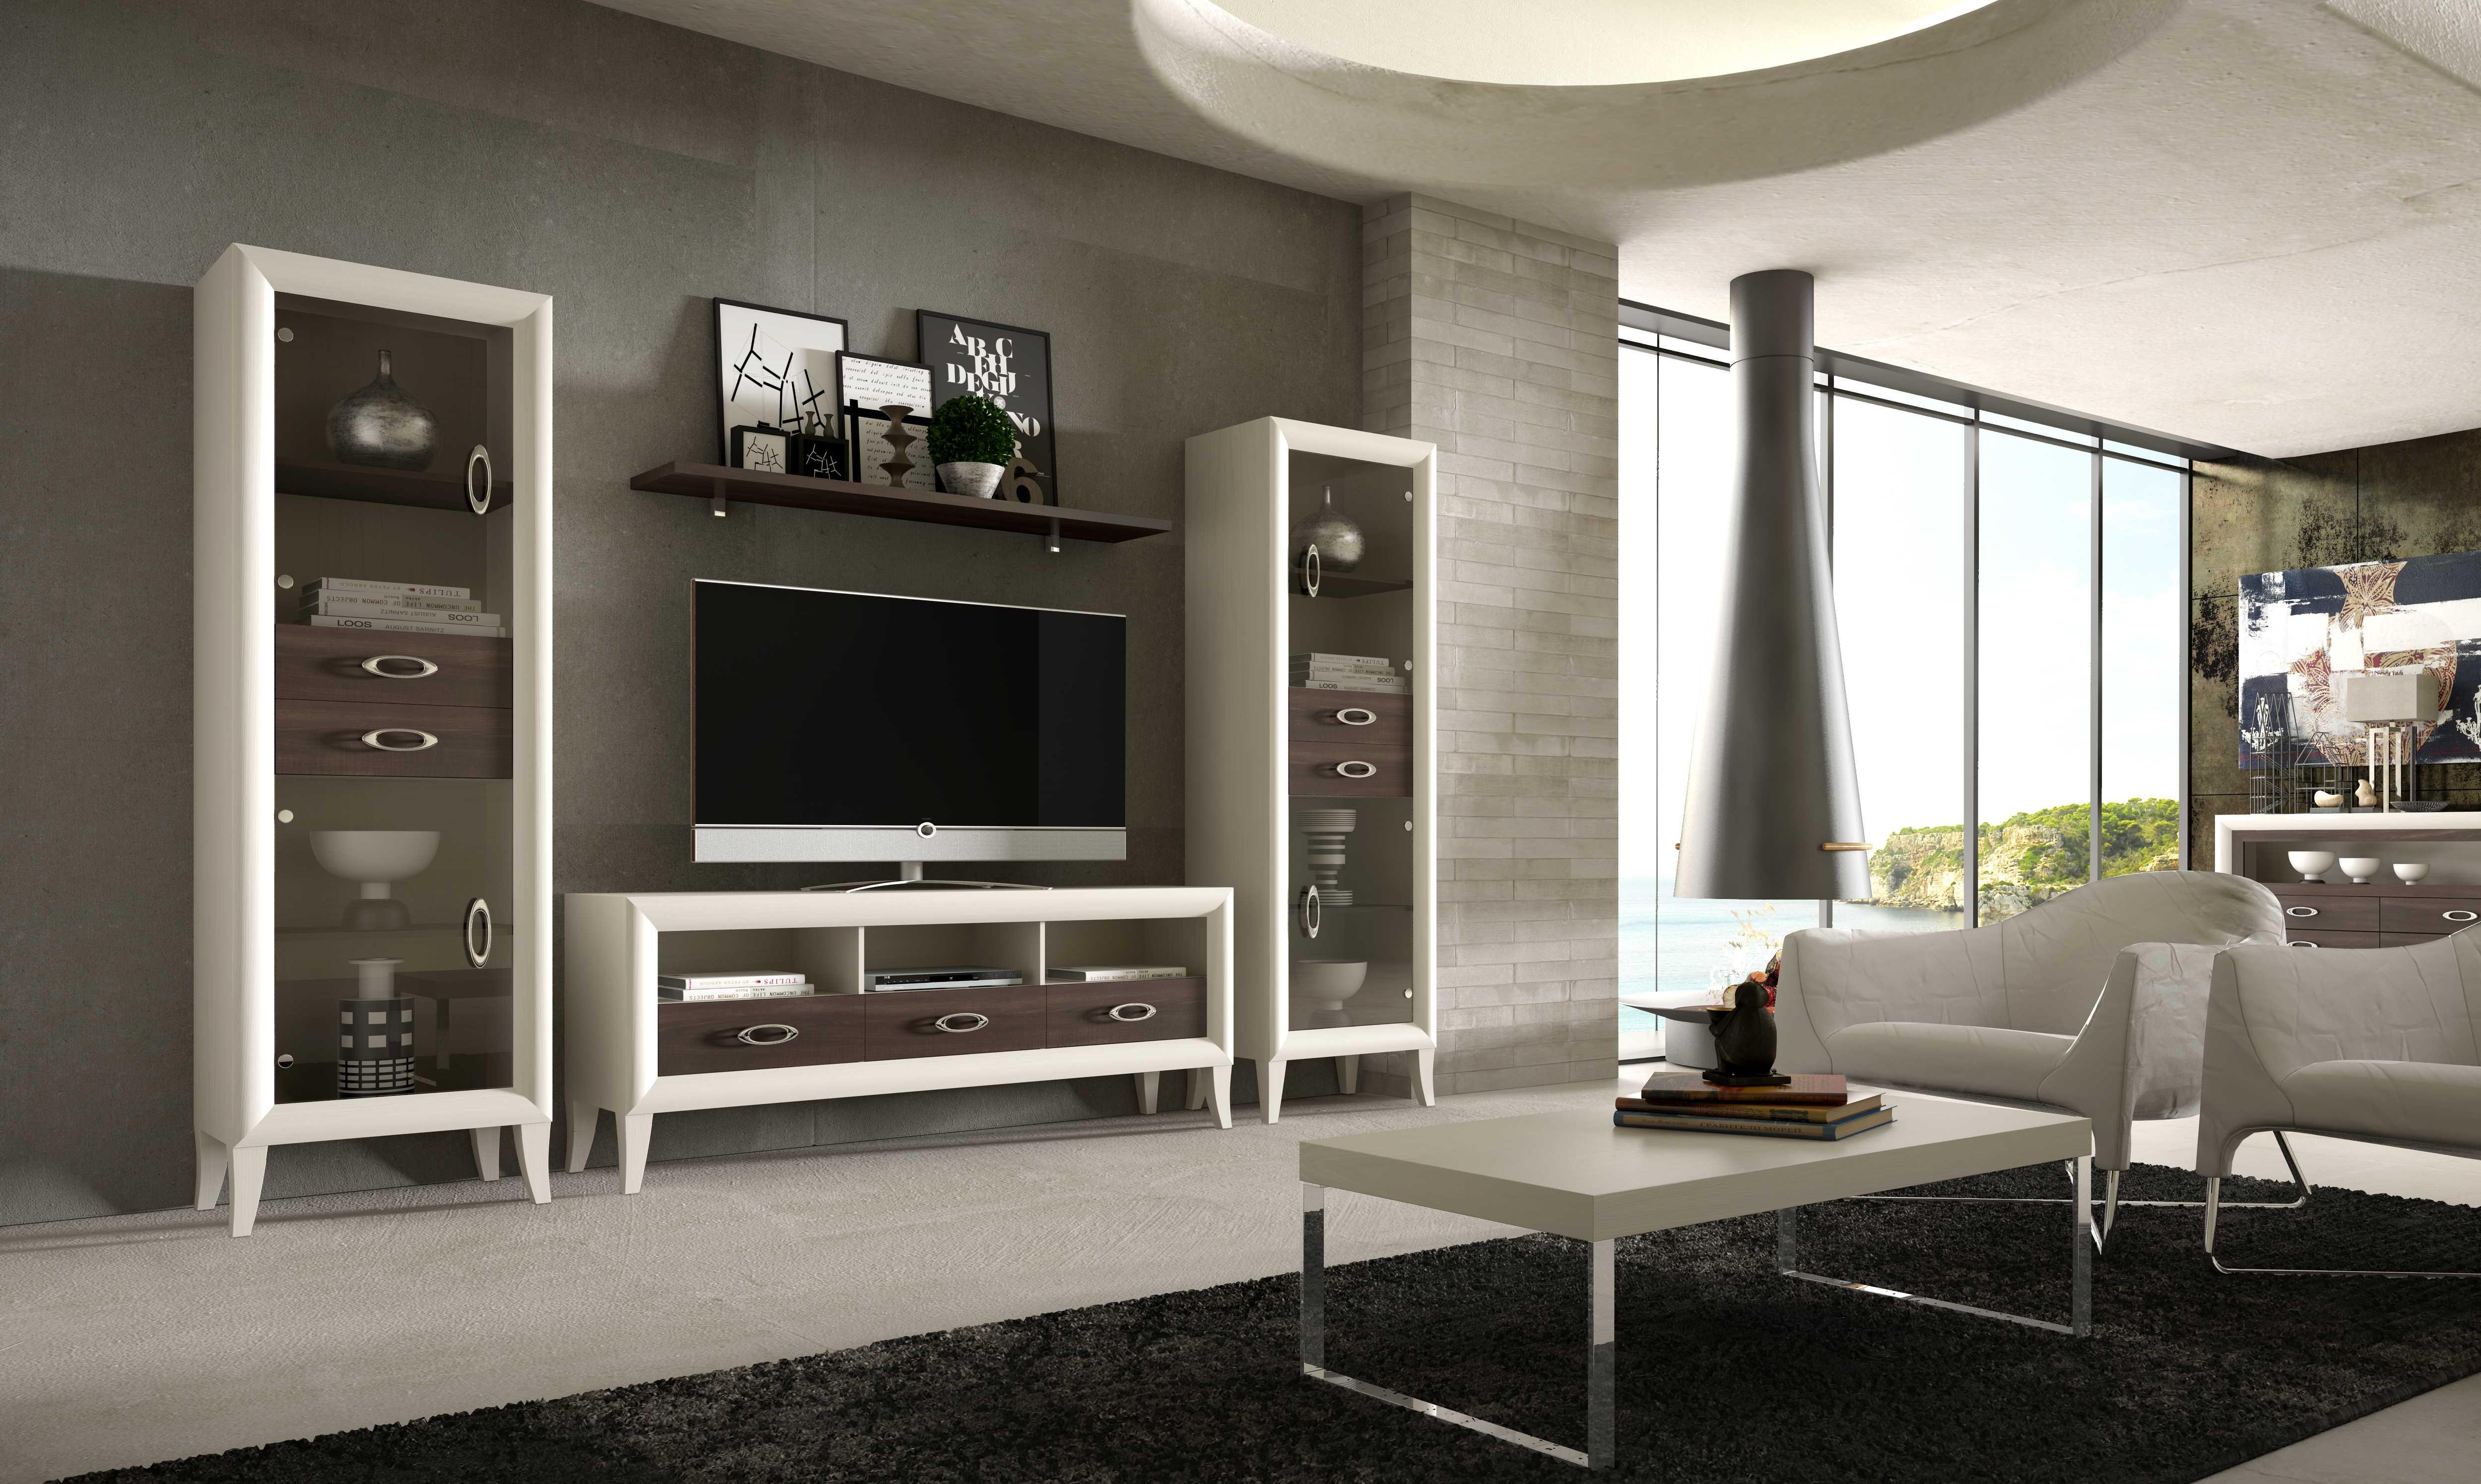 salon-contemporaneo-Marilyn-muebles-paco-caballero-806-5cc6c095ad2b5